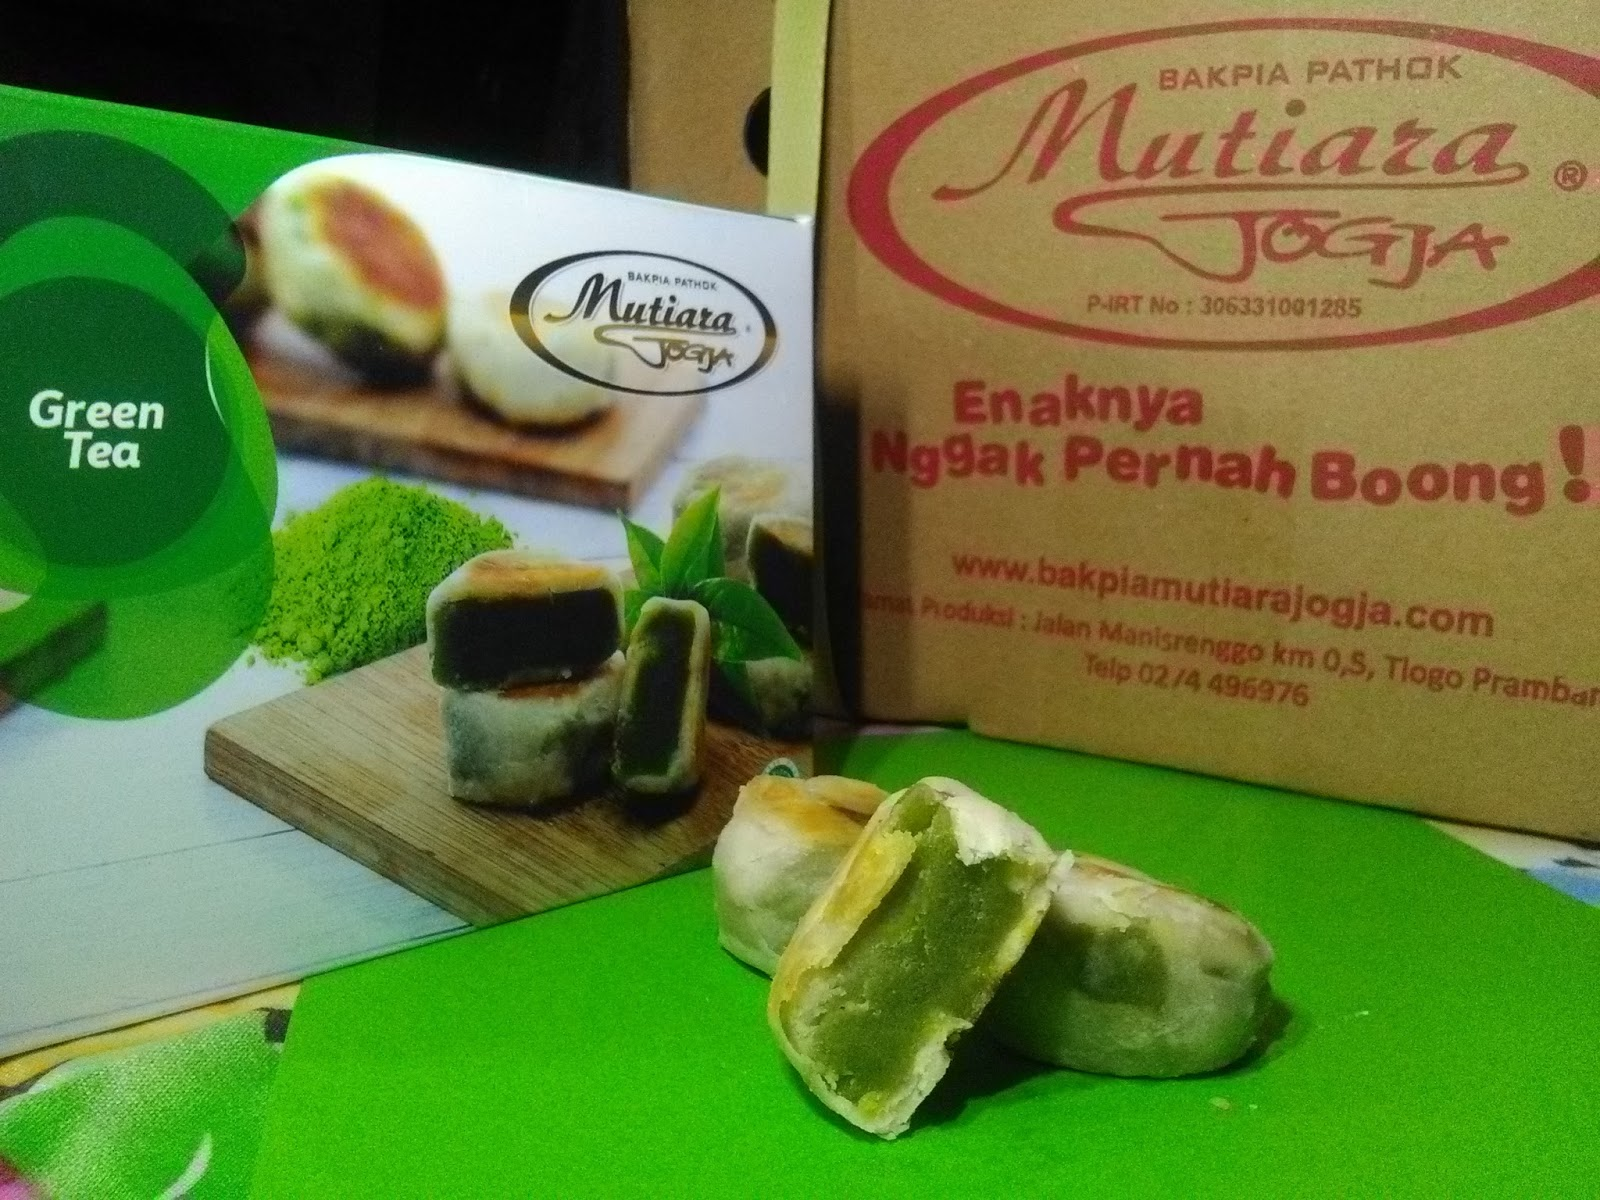 Bakpia Mutiara Jogja rasa Green Tea